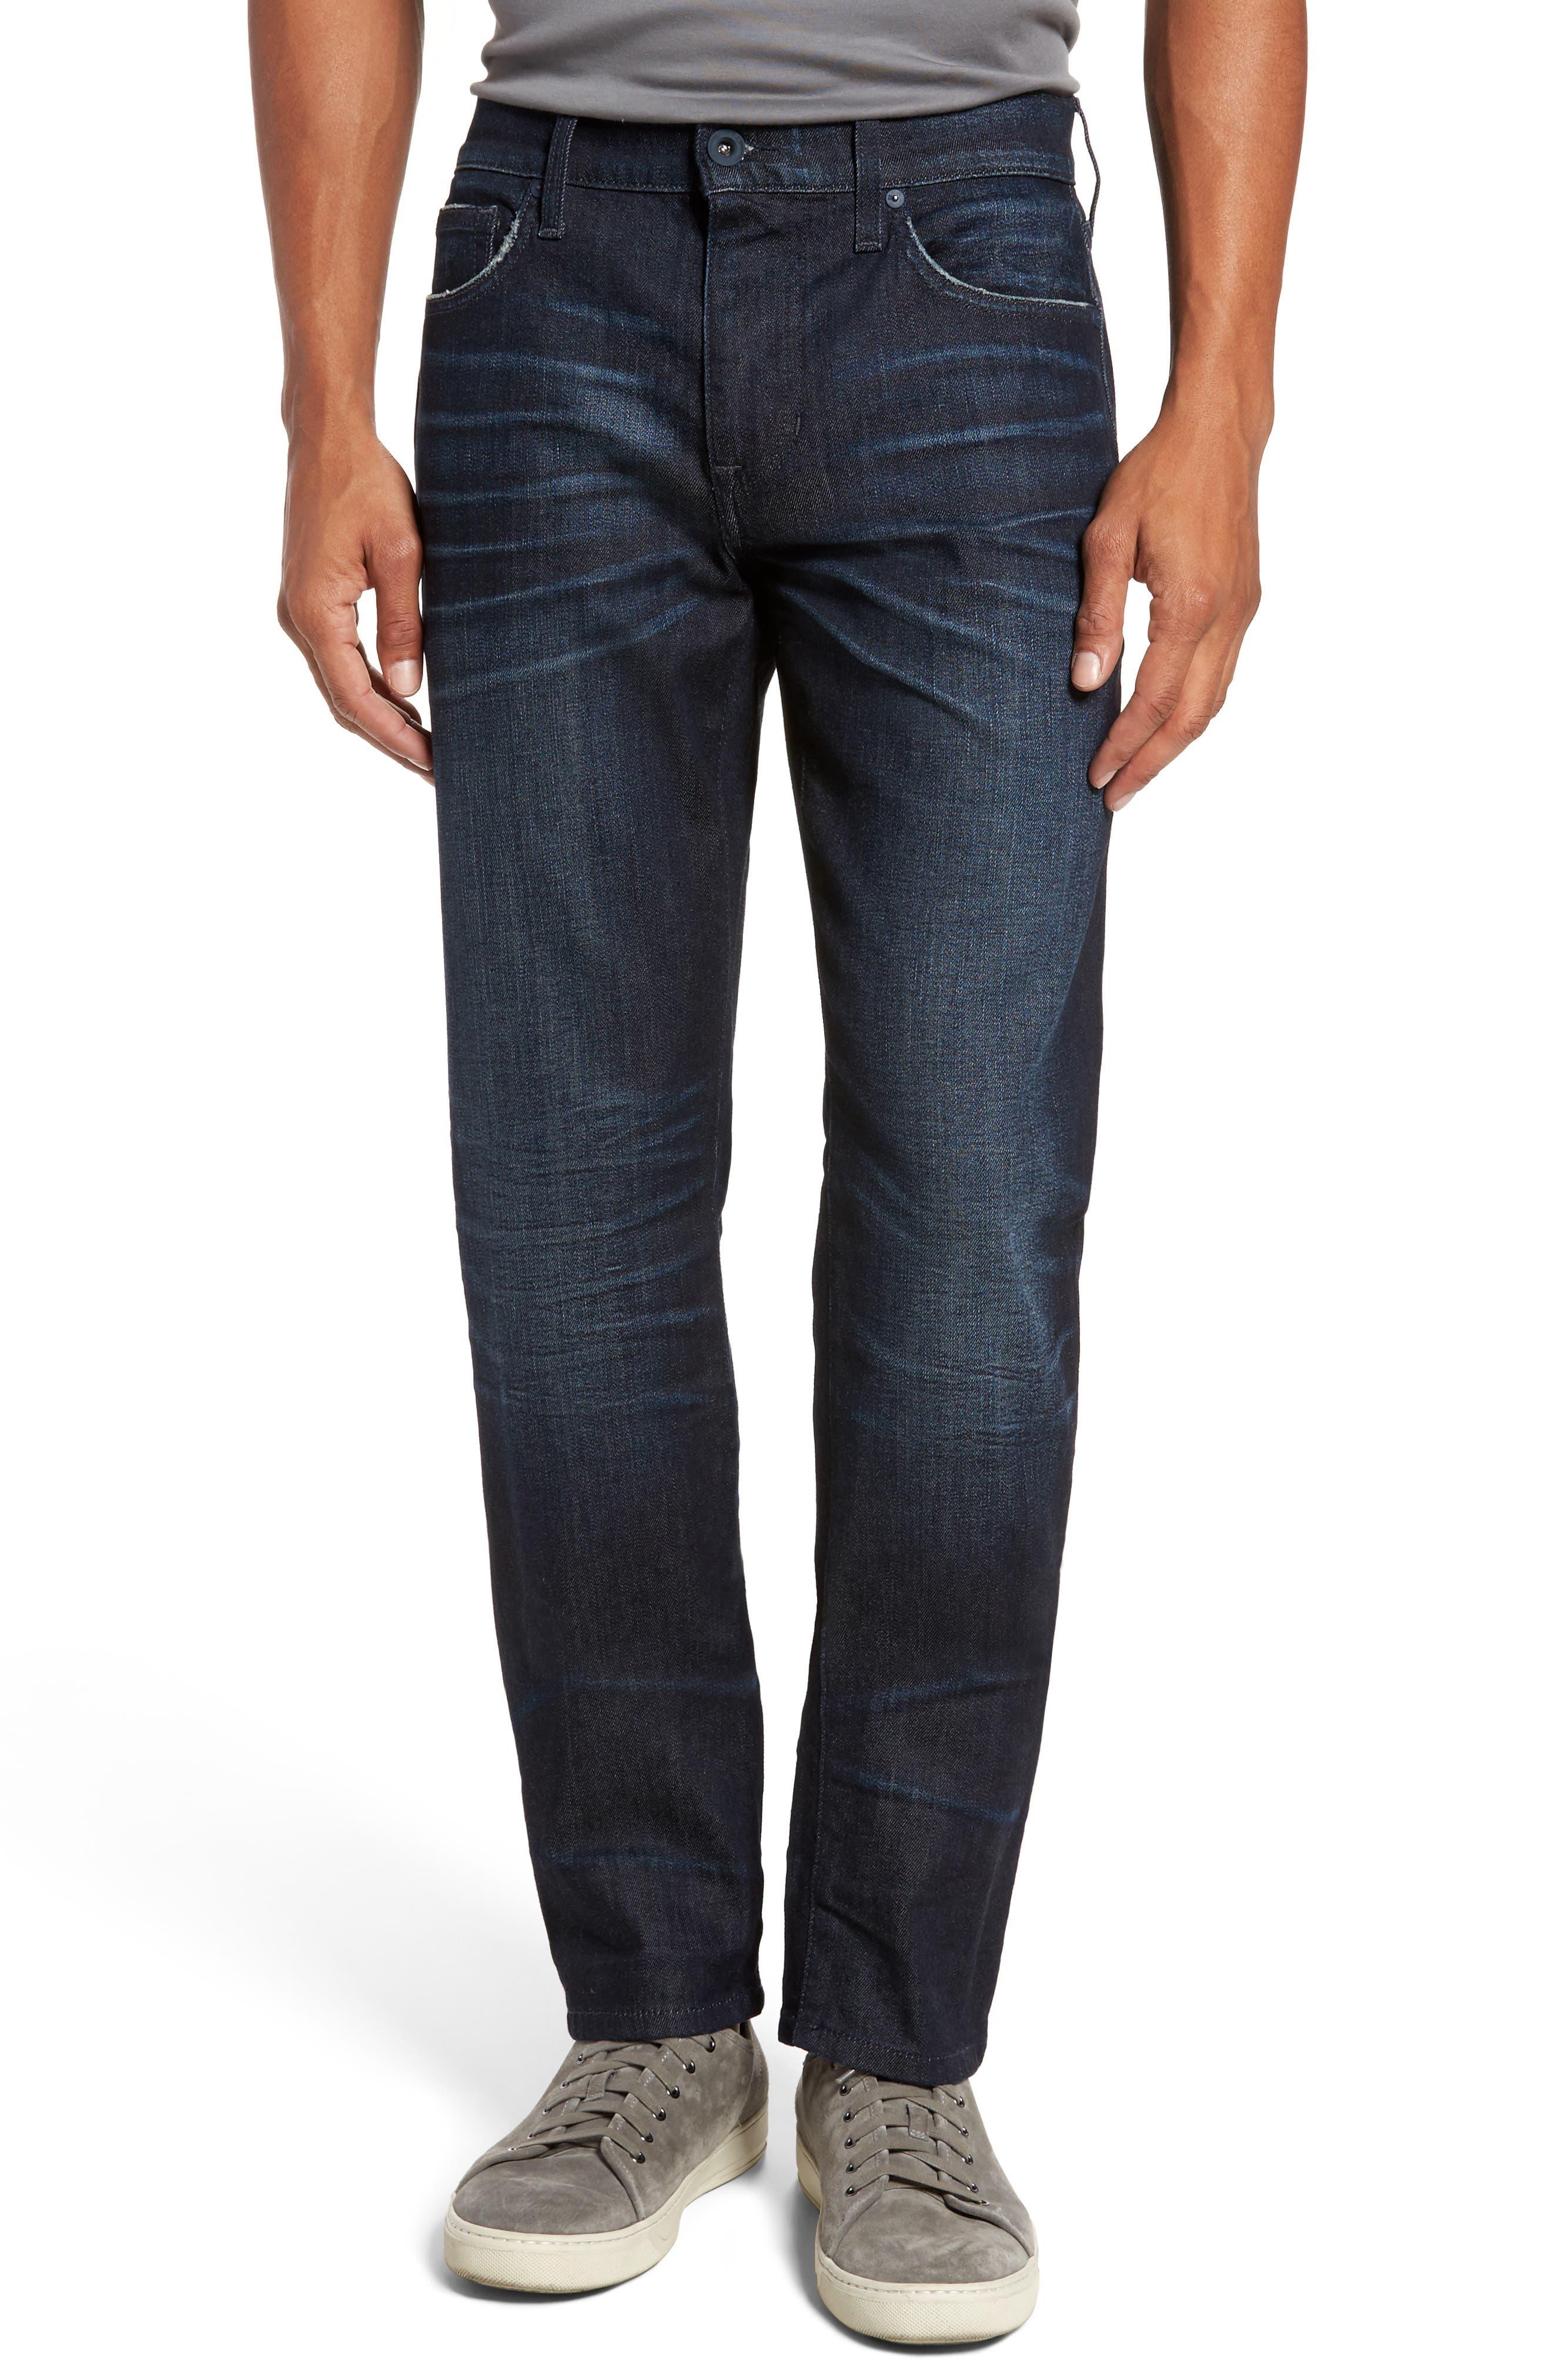 Brixton Slim Straight Fit Jeans,                         Main,                         color, 405